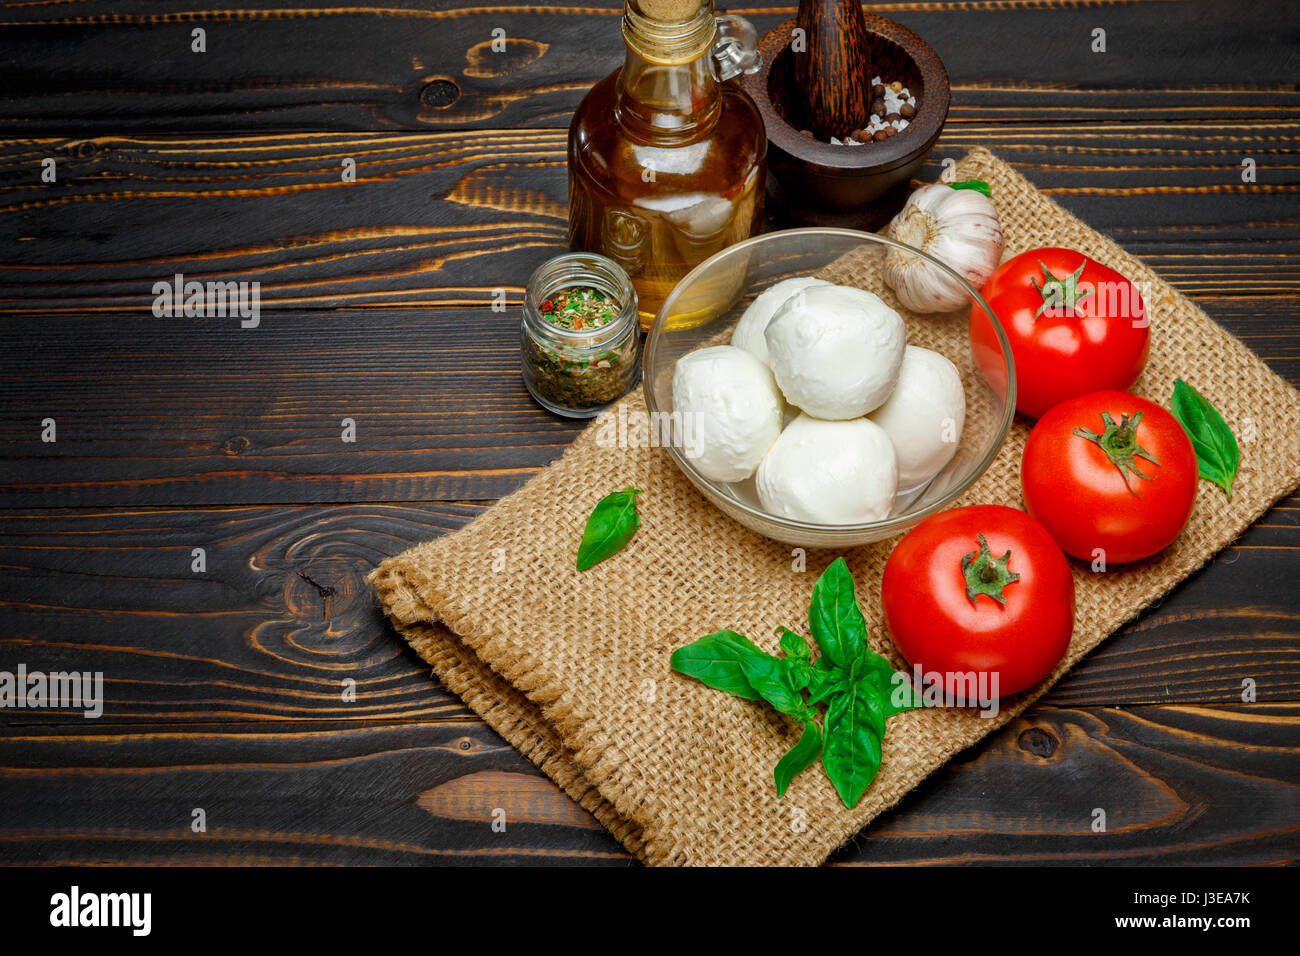 Caprese salad ingridients - Mozzarella and tomato - Stock Image